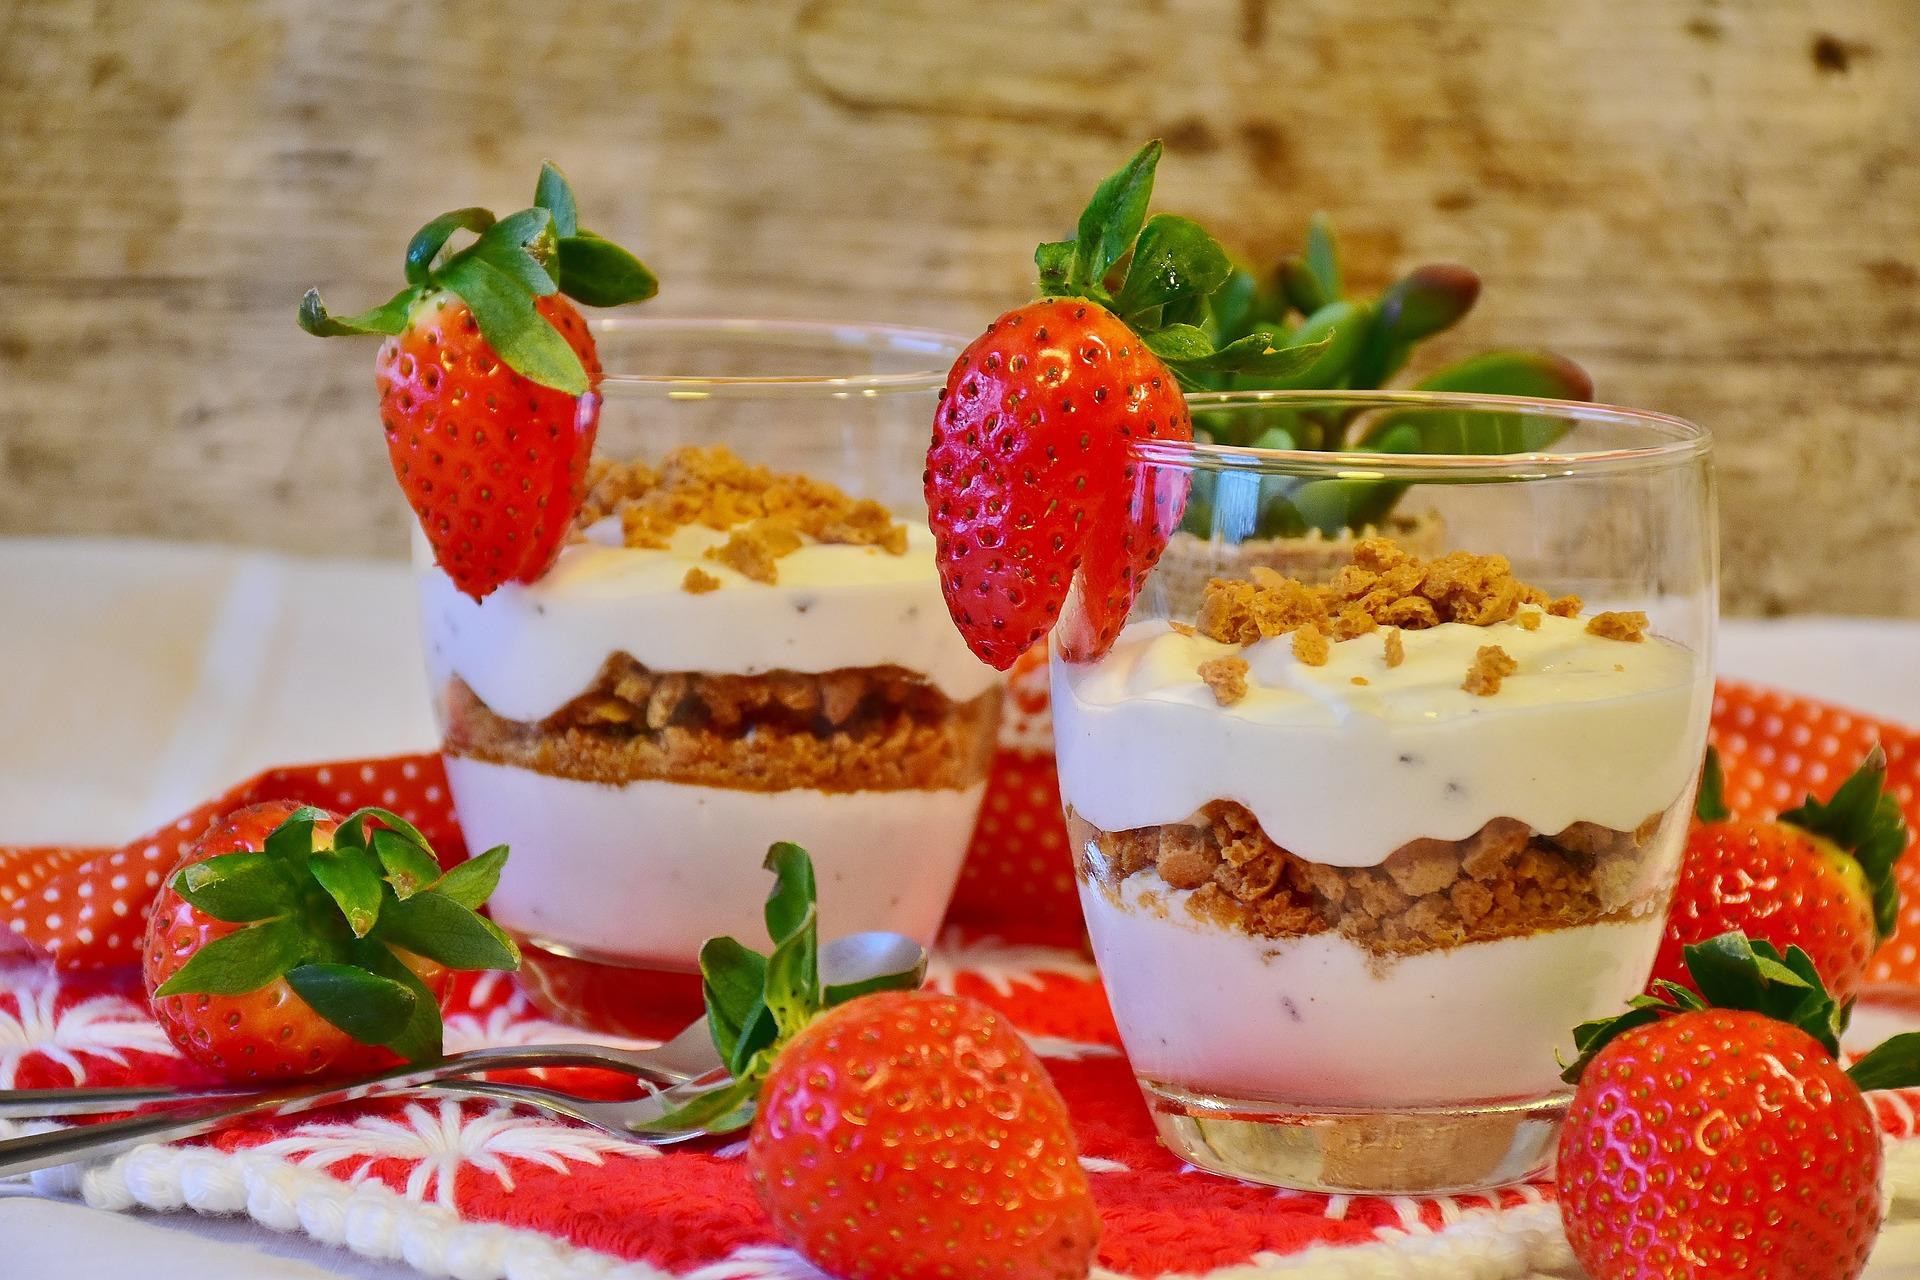 micul dejun - sfatulparintilor.ro - pixabay_com - strawberry-dessert-2076155_1920